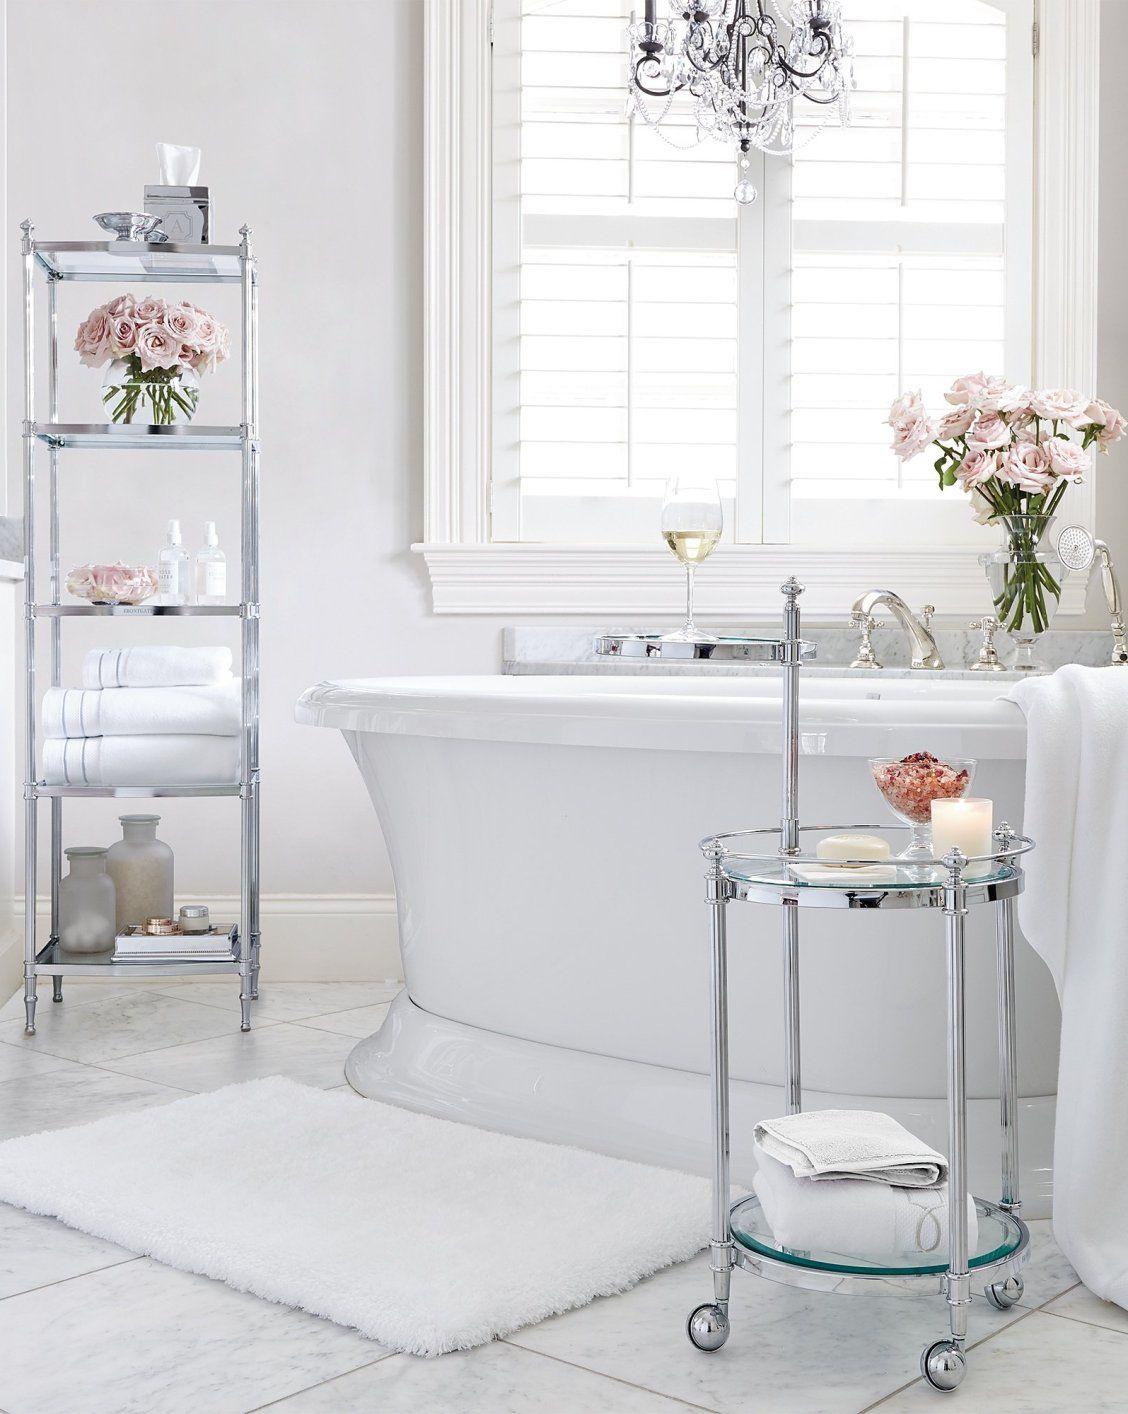 Belmont Etageres Frontgate Bathroom Etagere Bathroom Furniture Bathroom Decor